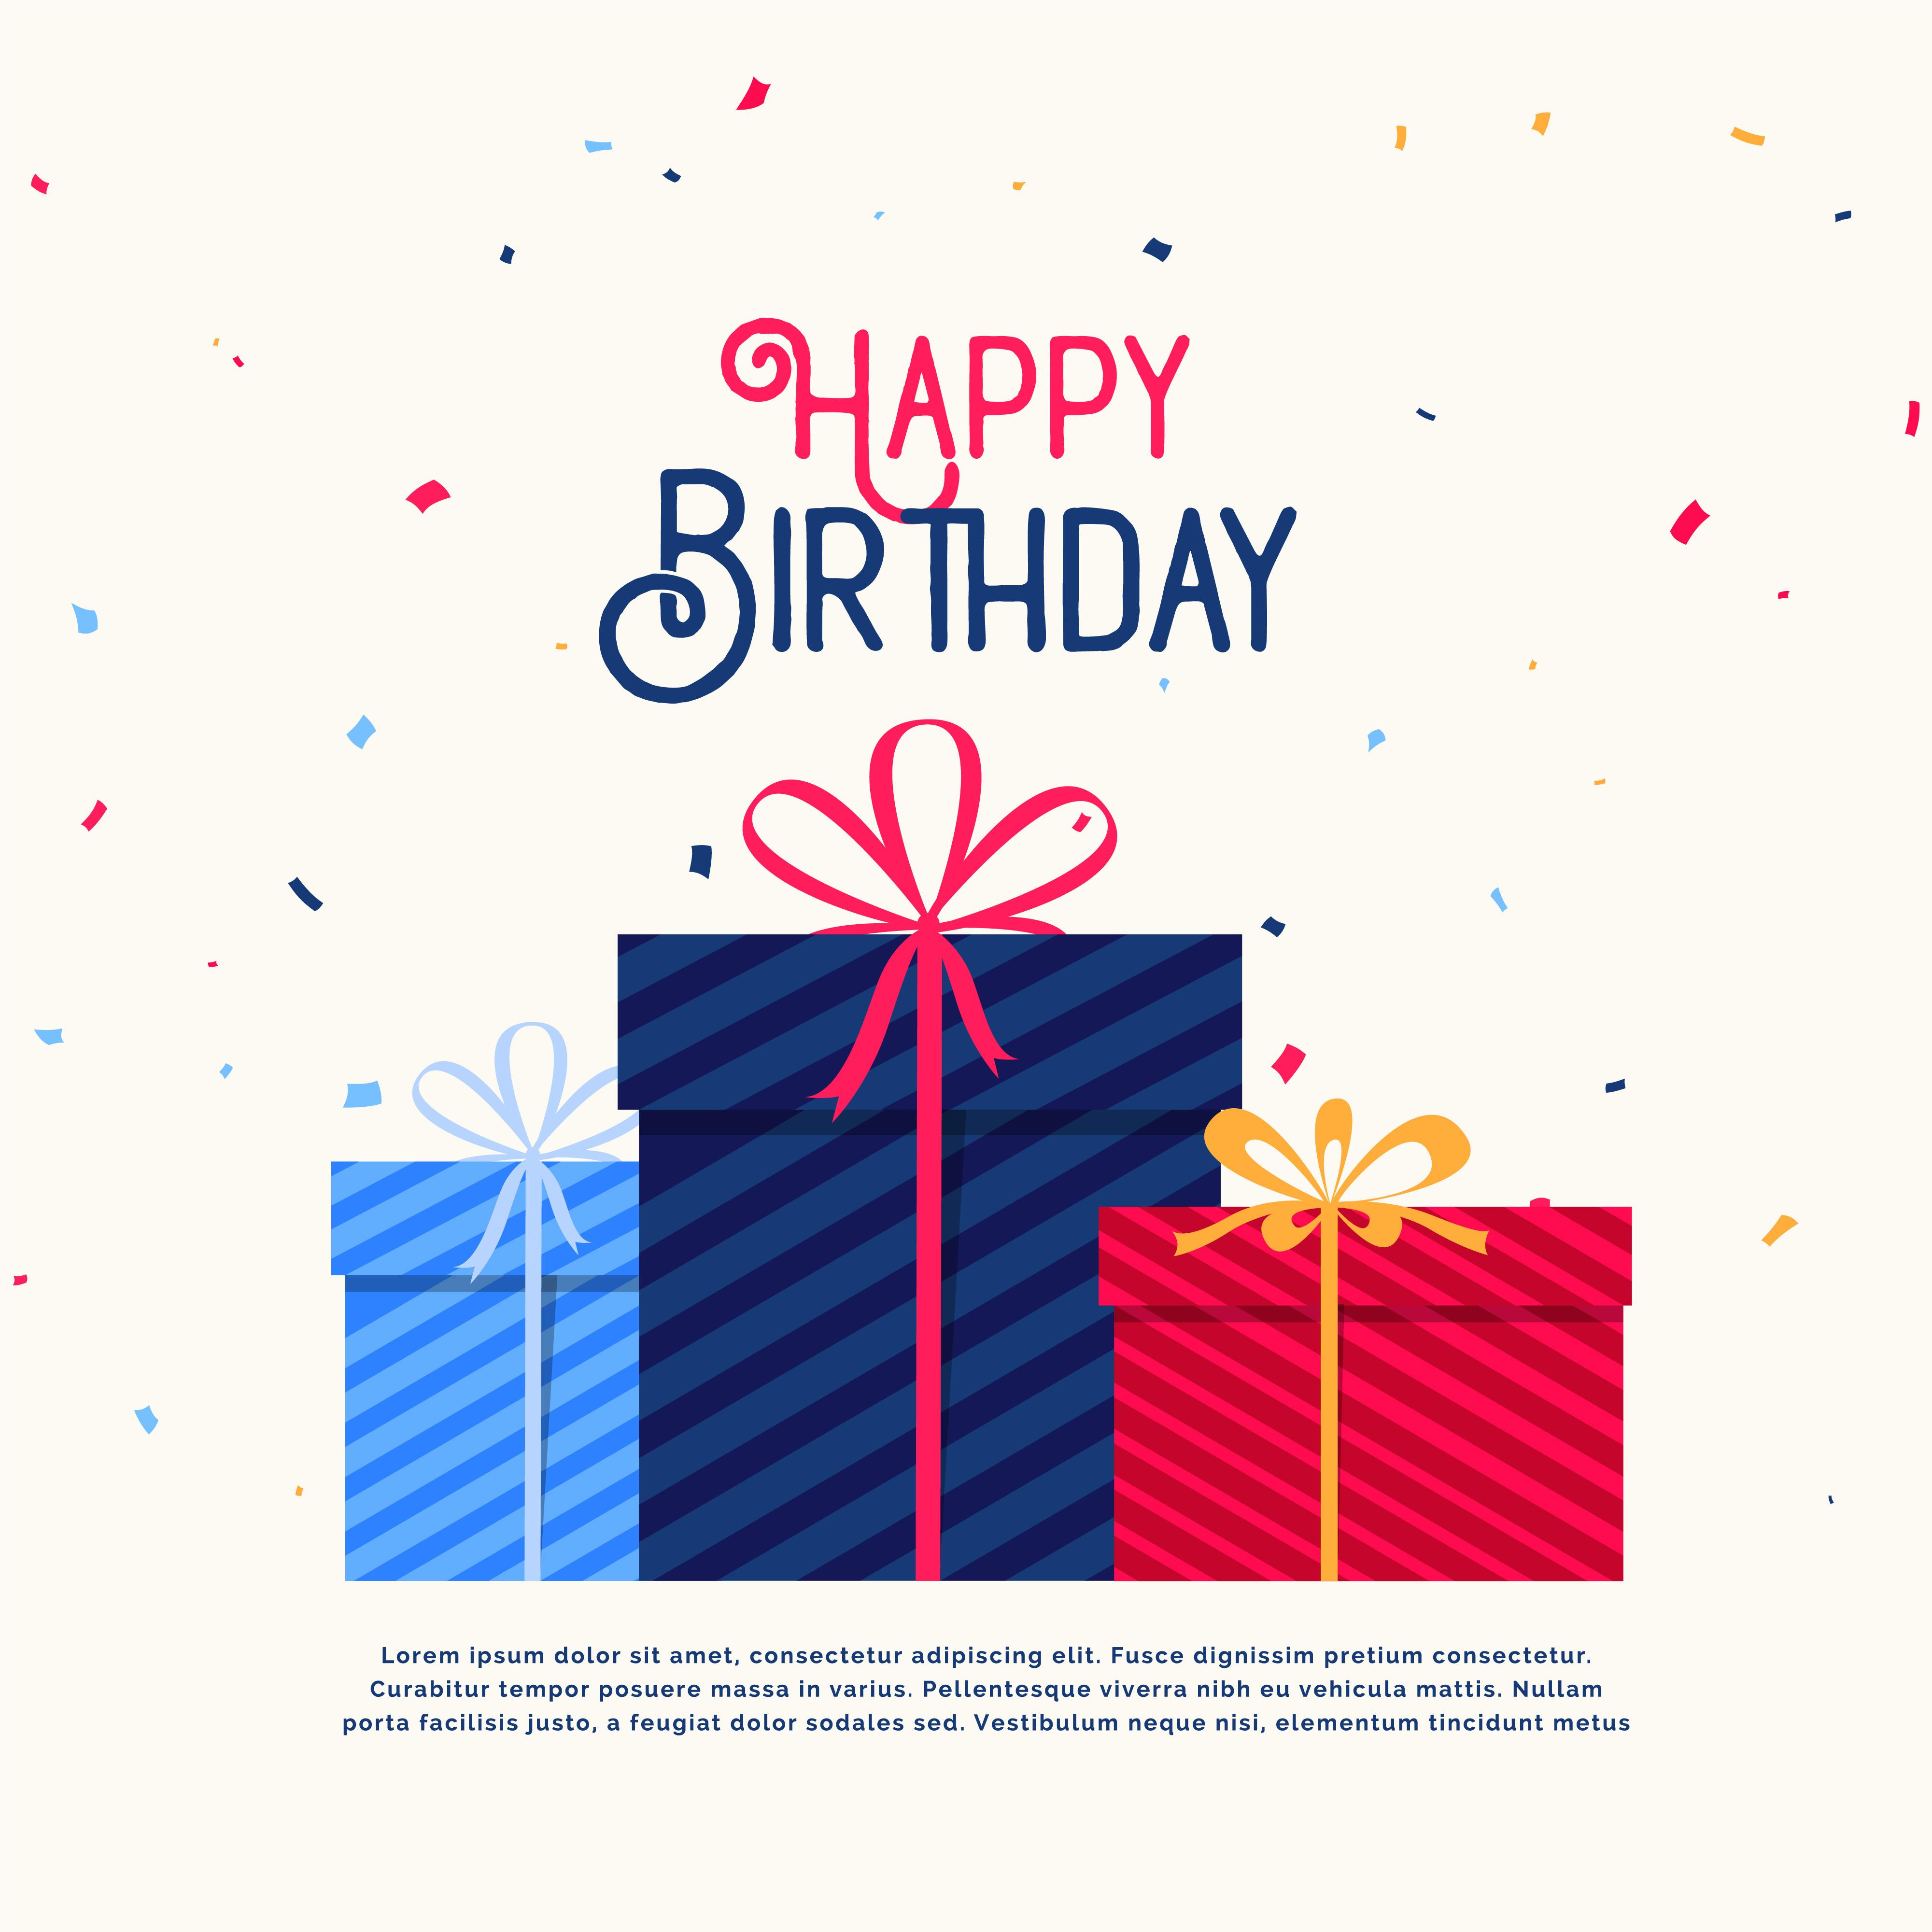 birthday present free vector art 10448 free downloads